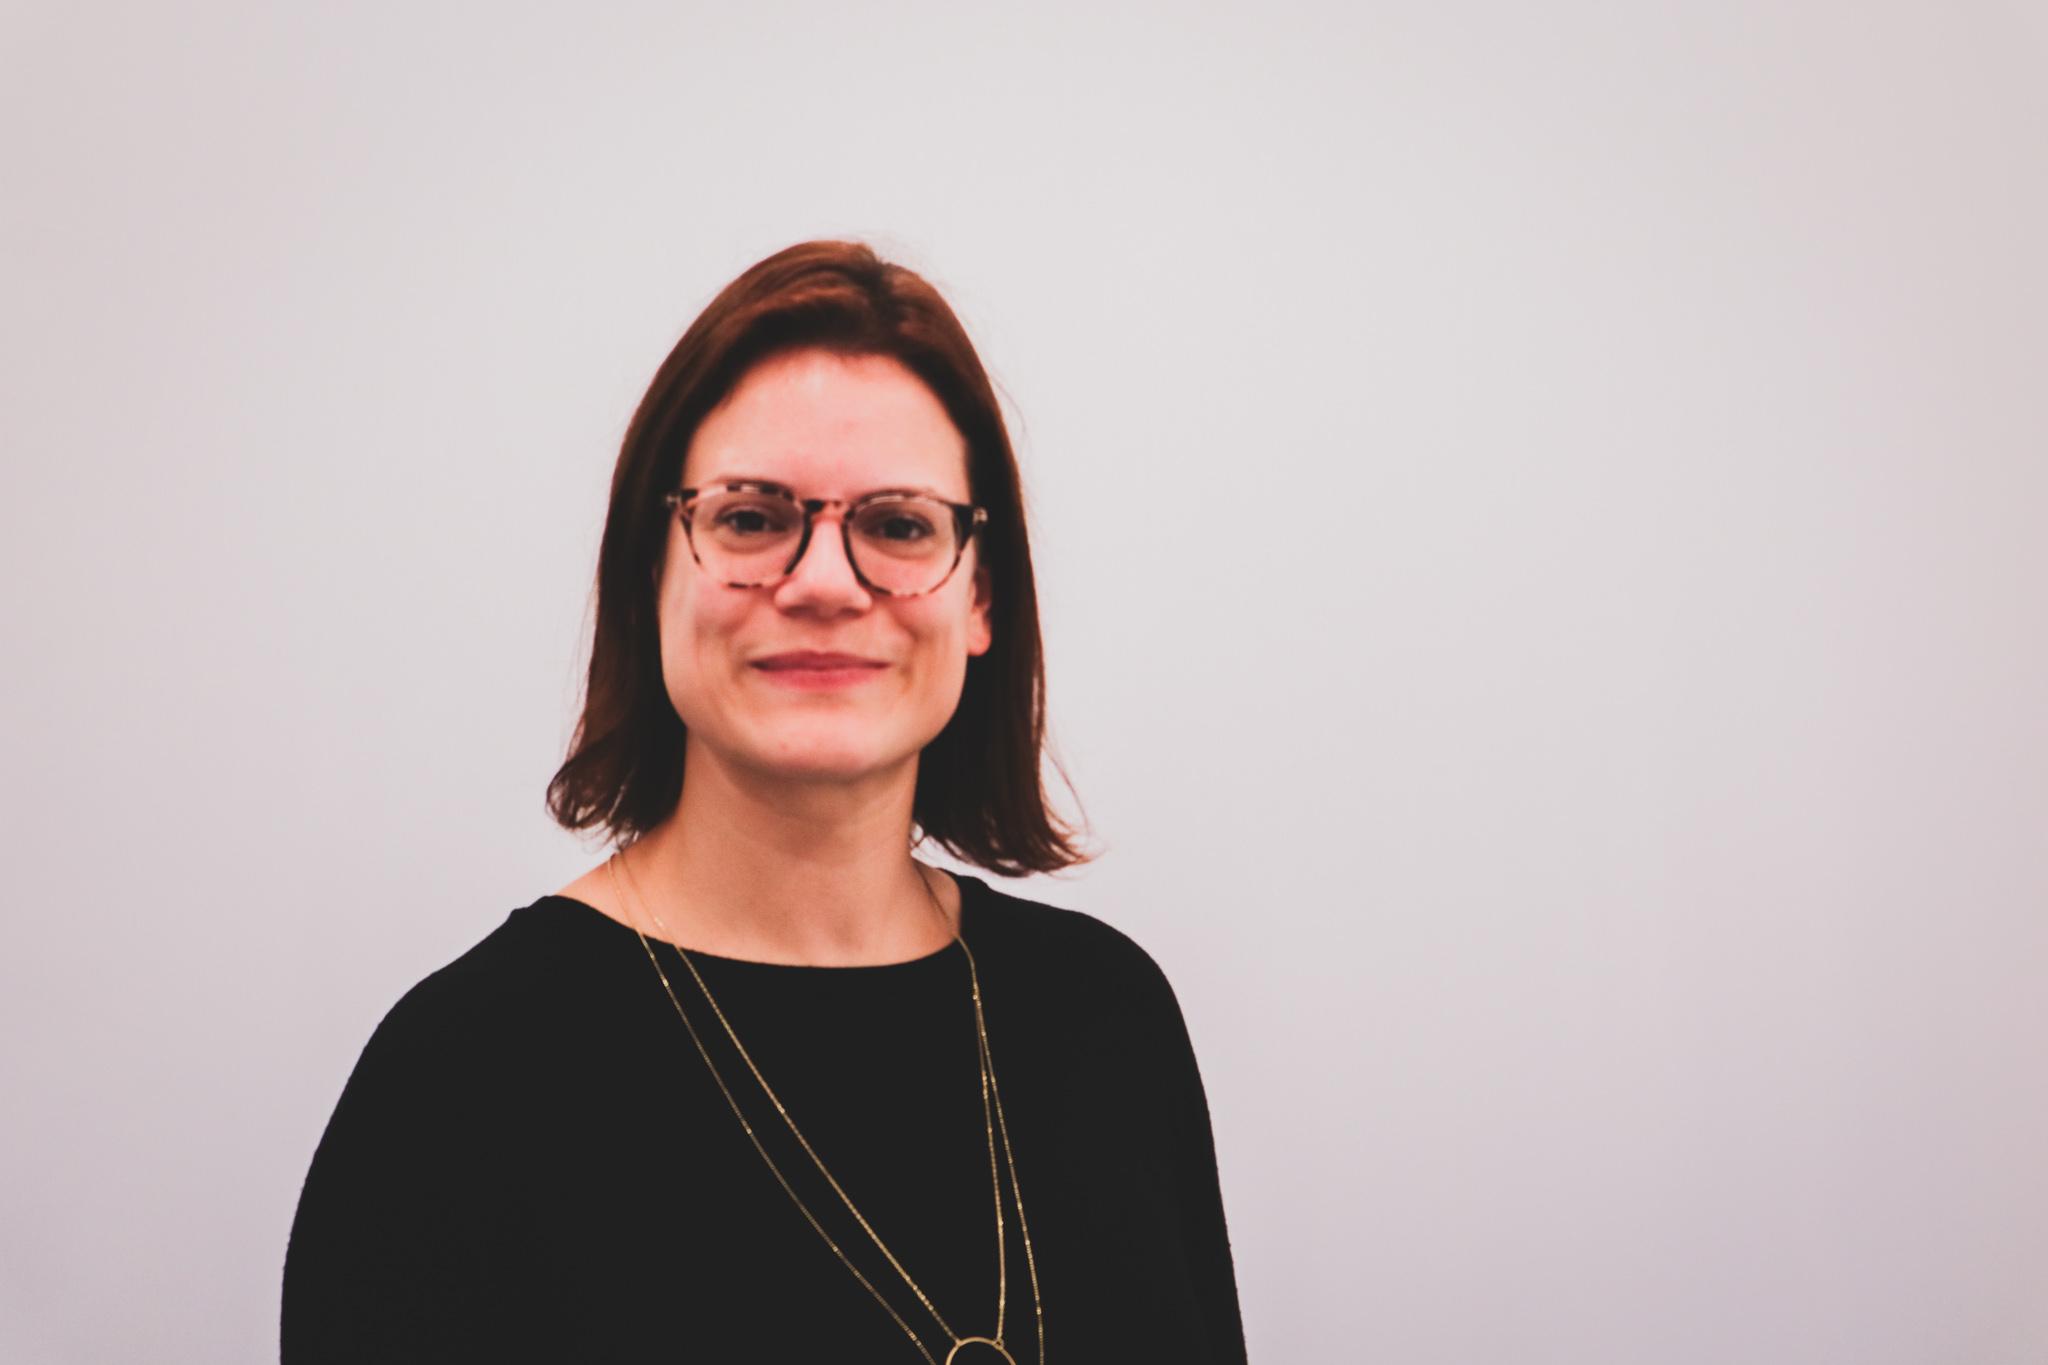 Tiffany Pörtner